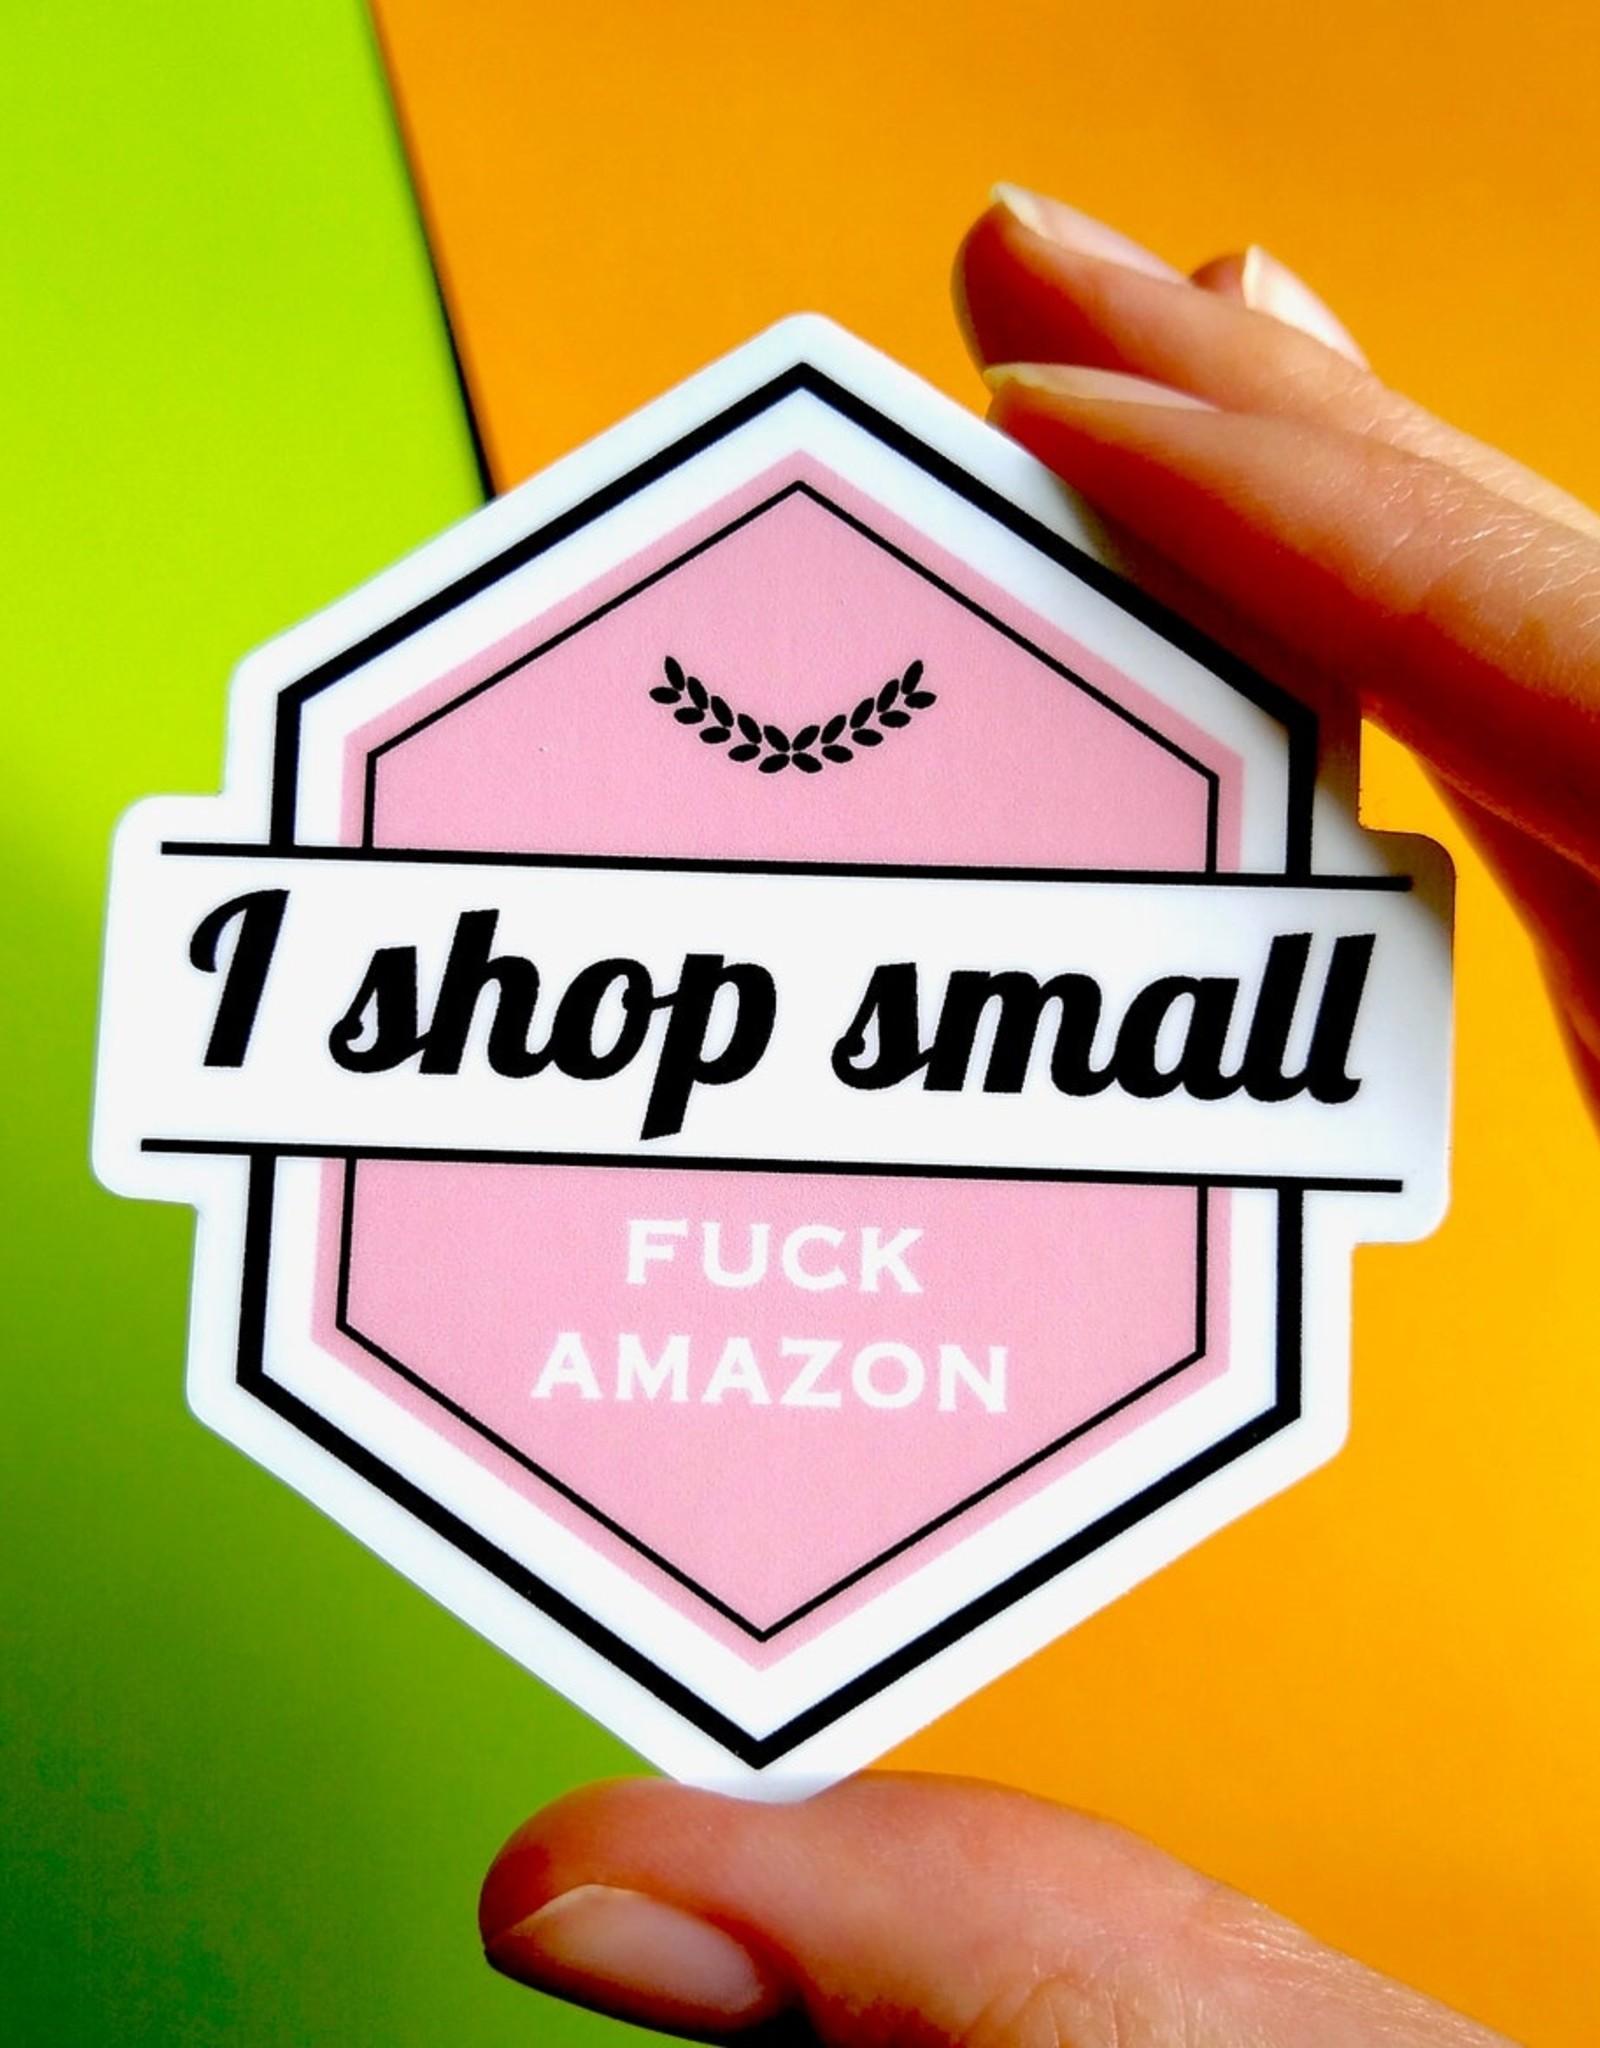 Fem Cards Sticker - Shop Small Fuck Amazon